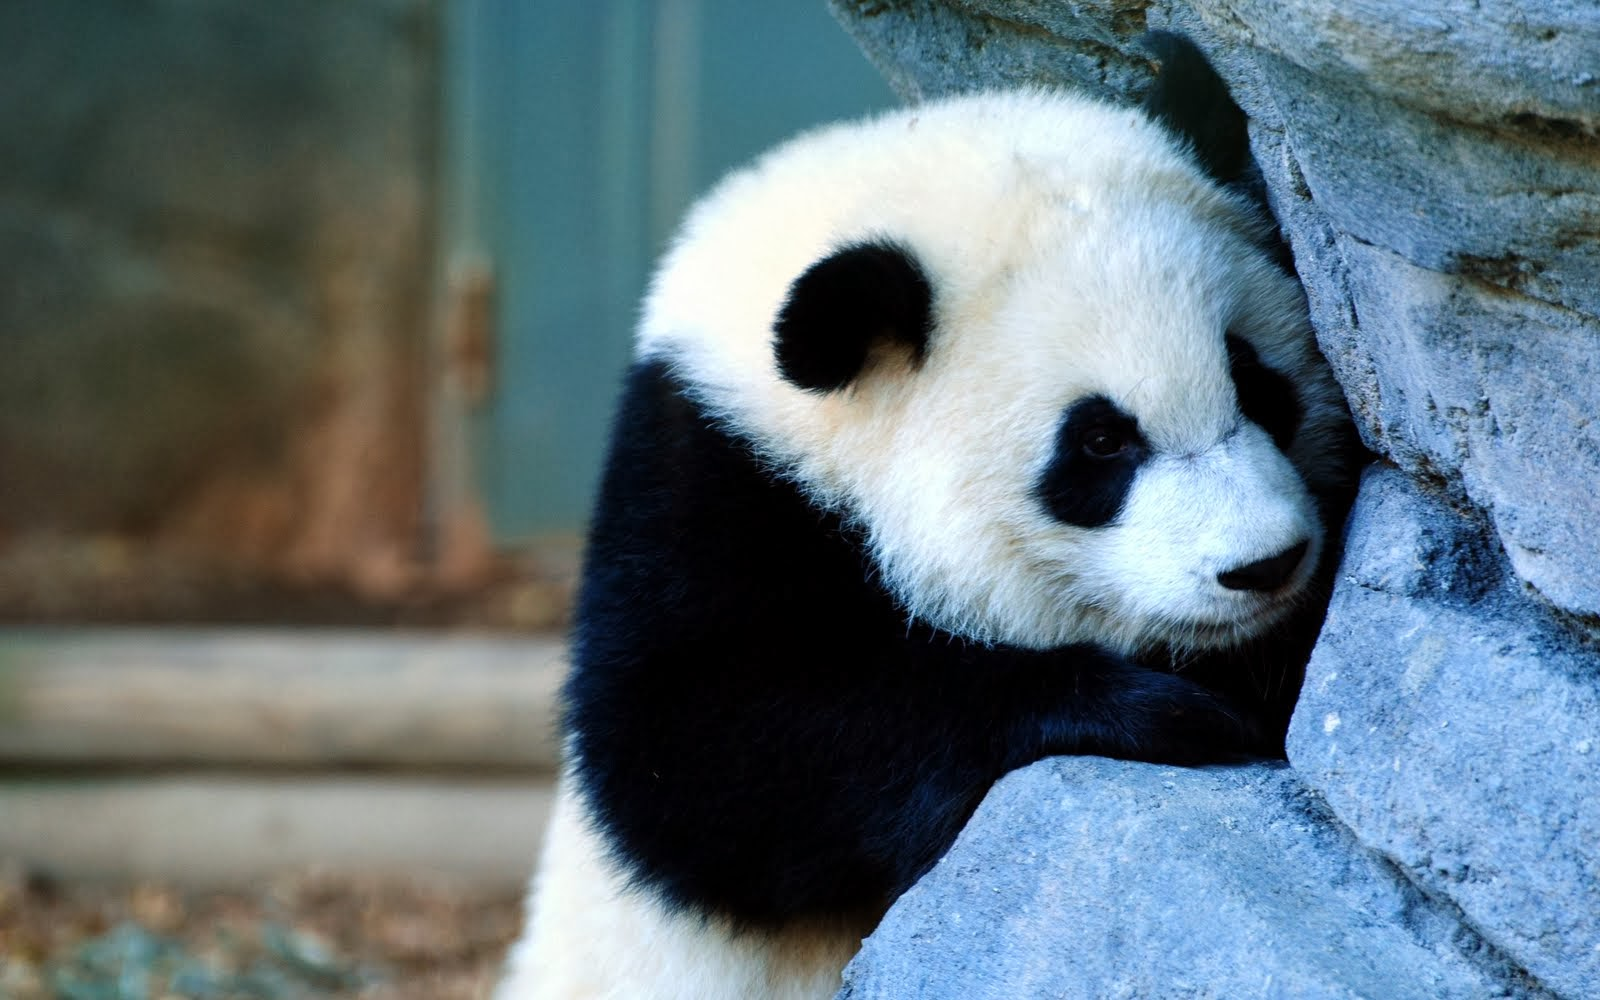 Best Wallpapers Pics Free Download Panda Hd Wallpapers